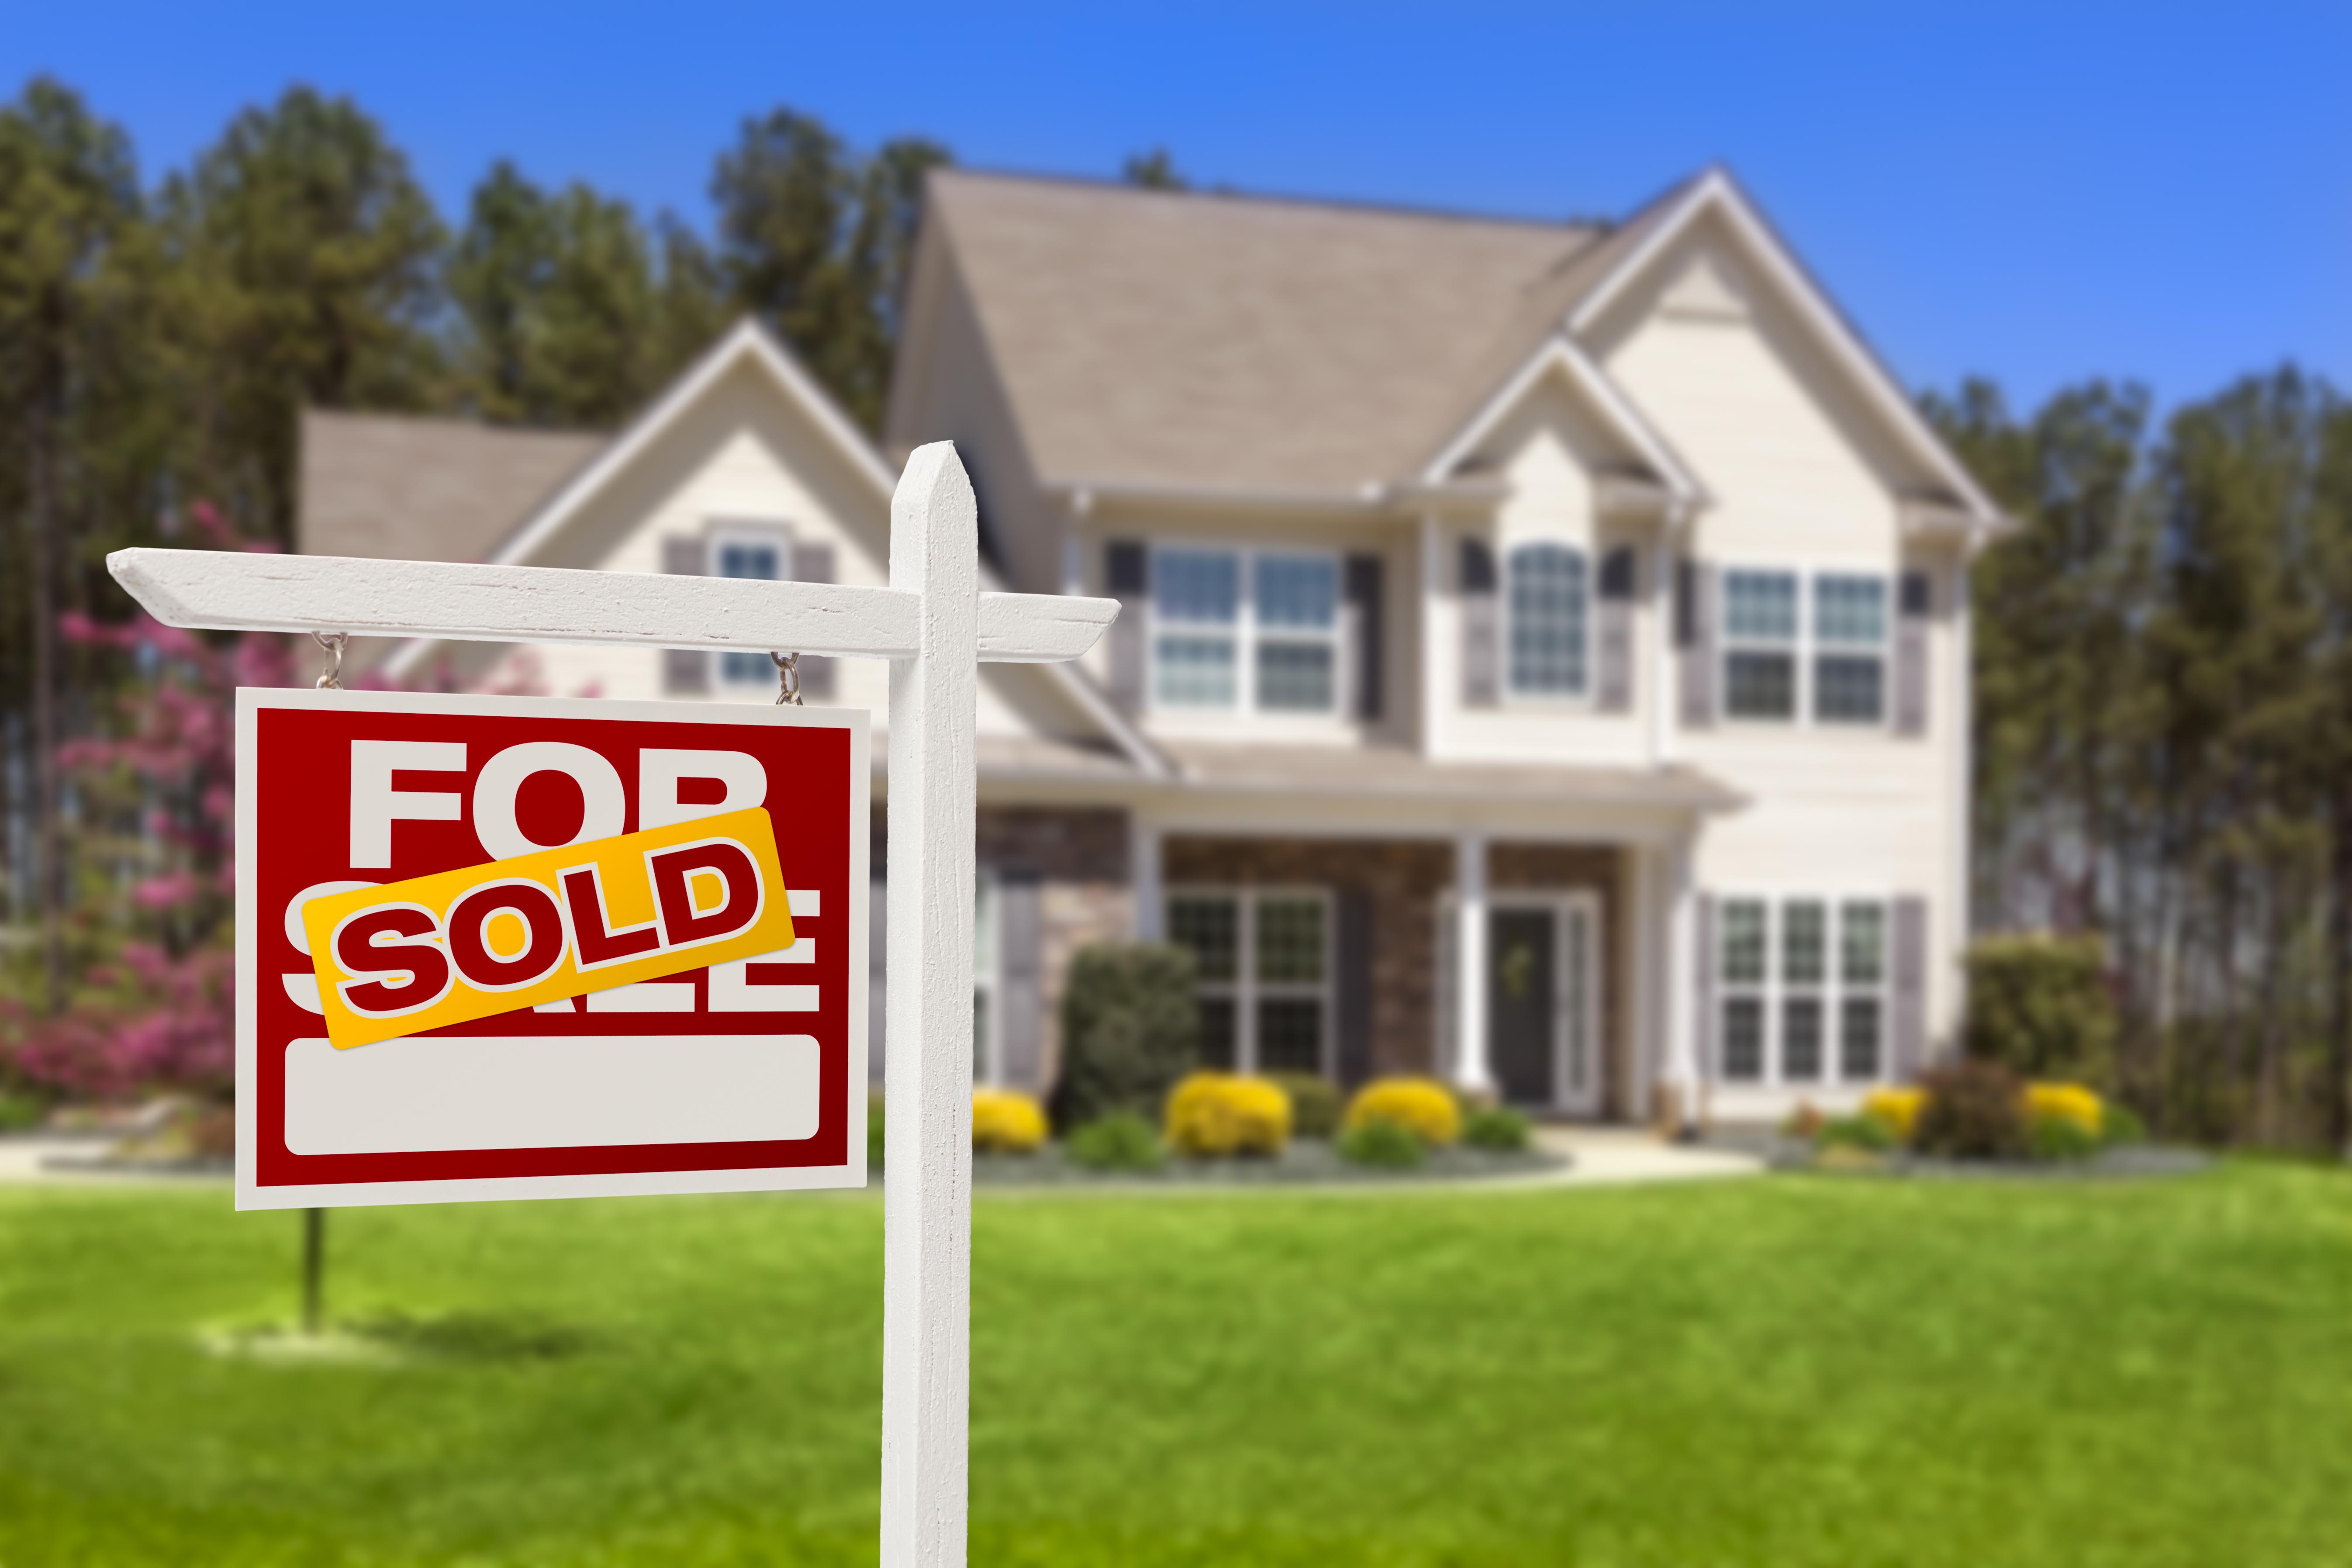 Homes For Sale in Farmington, Utah